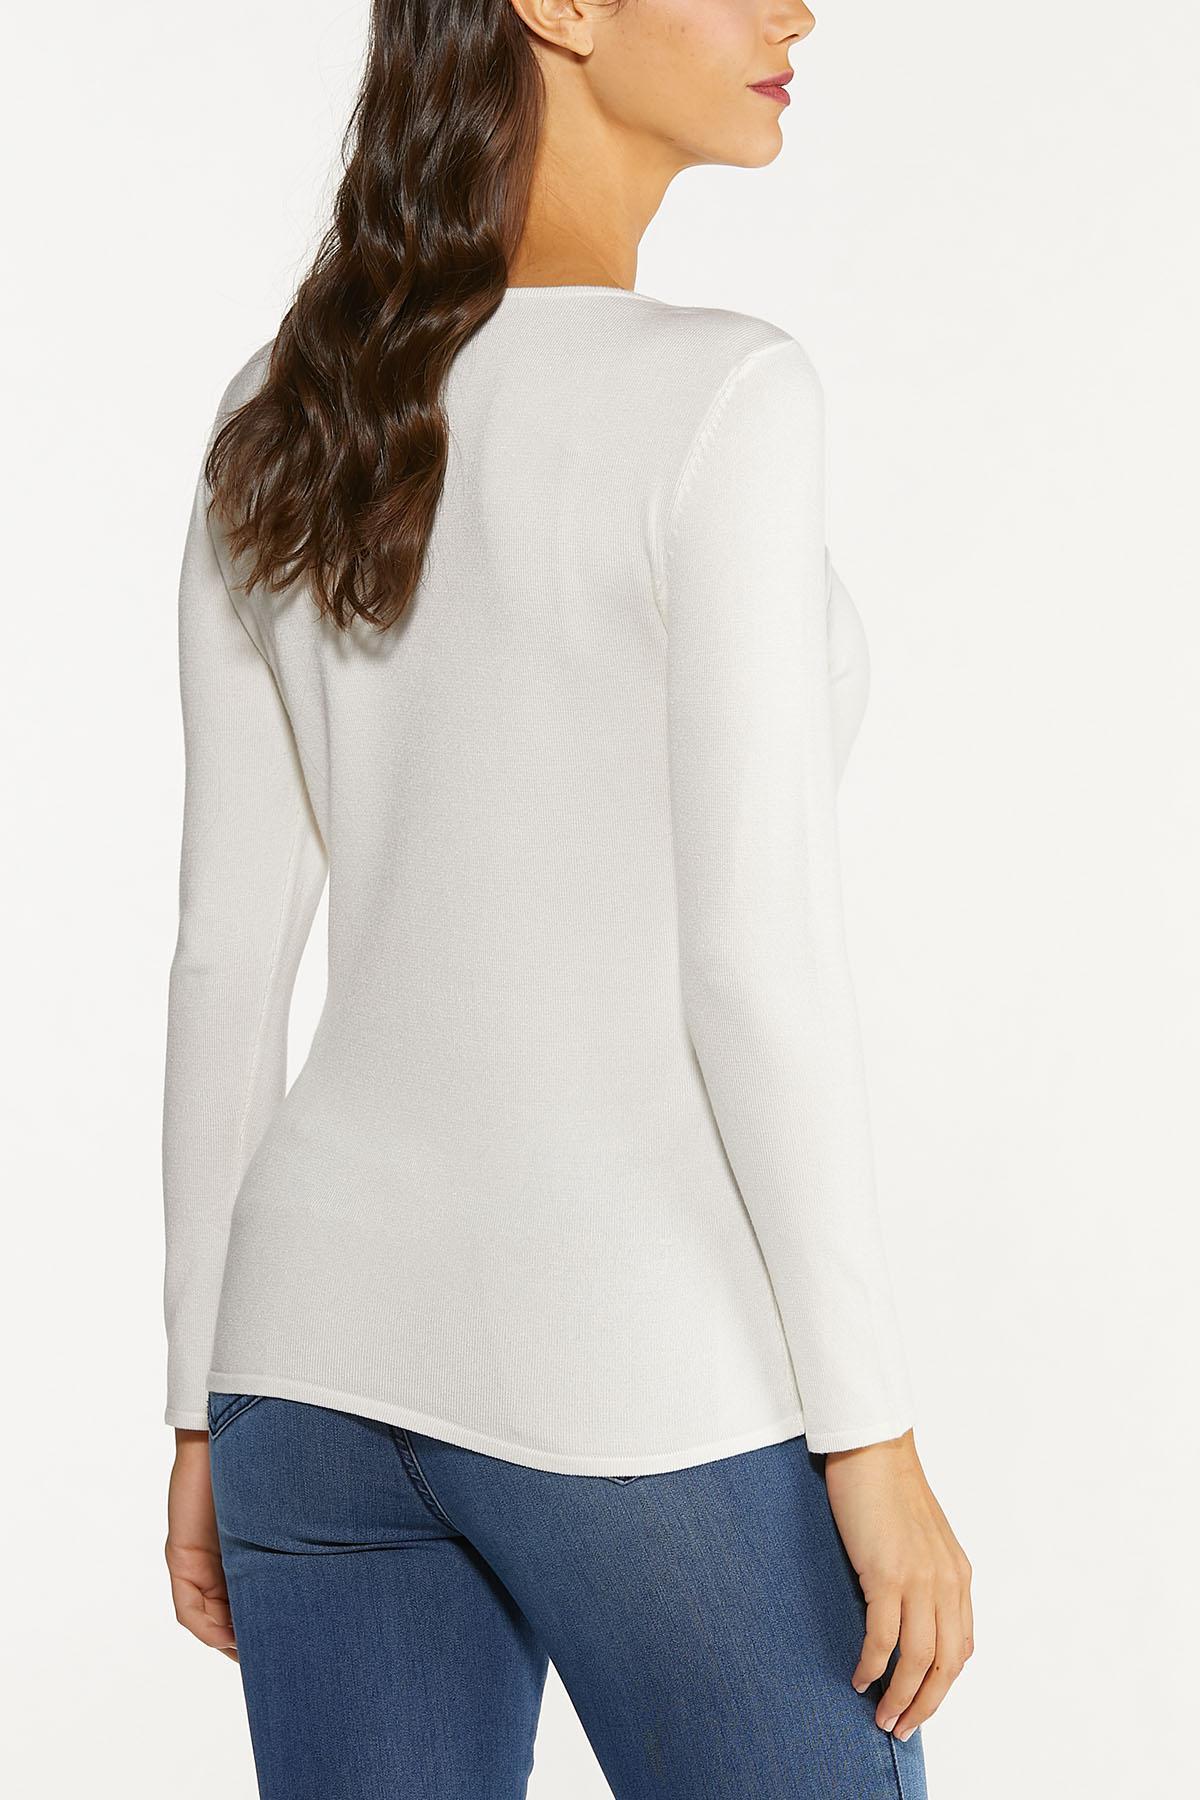 Plus Size Solid Scoop Neck Sweater (Item #44647052)